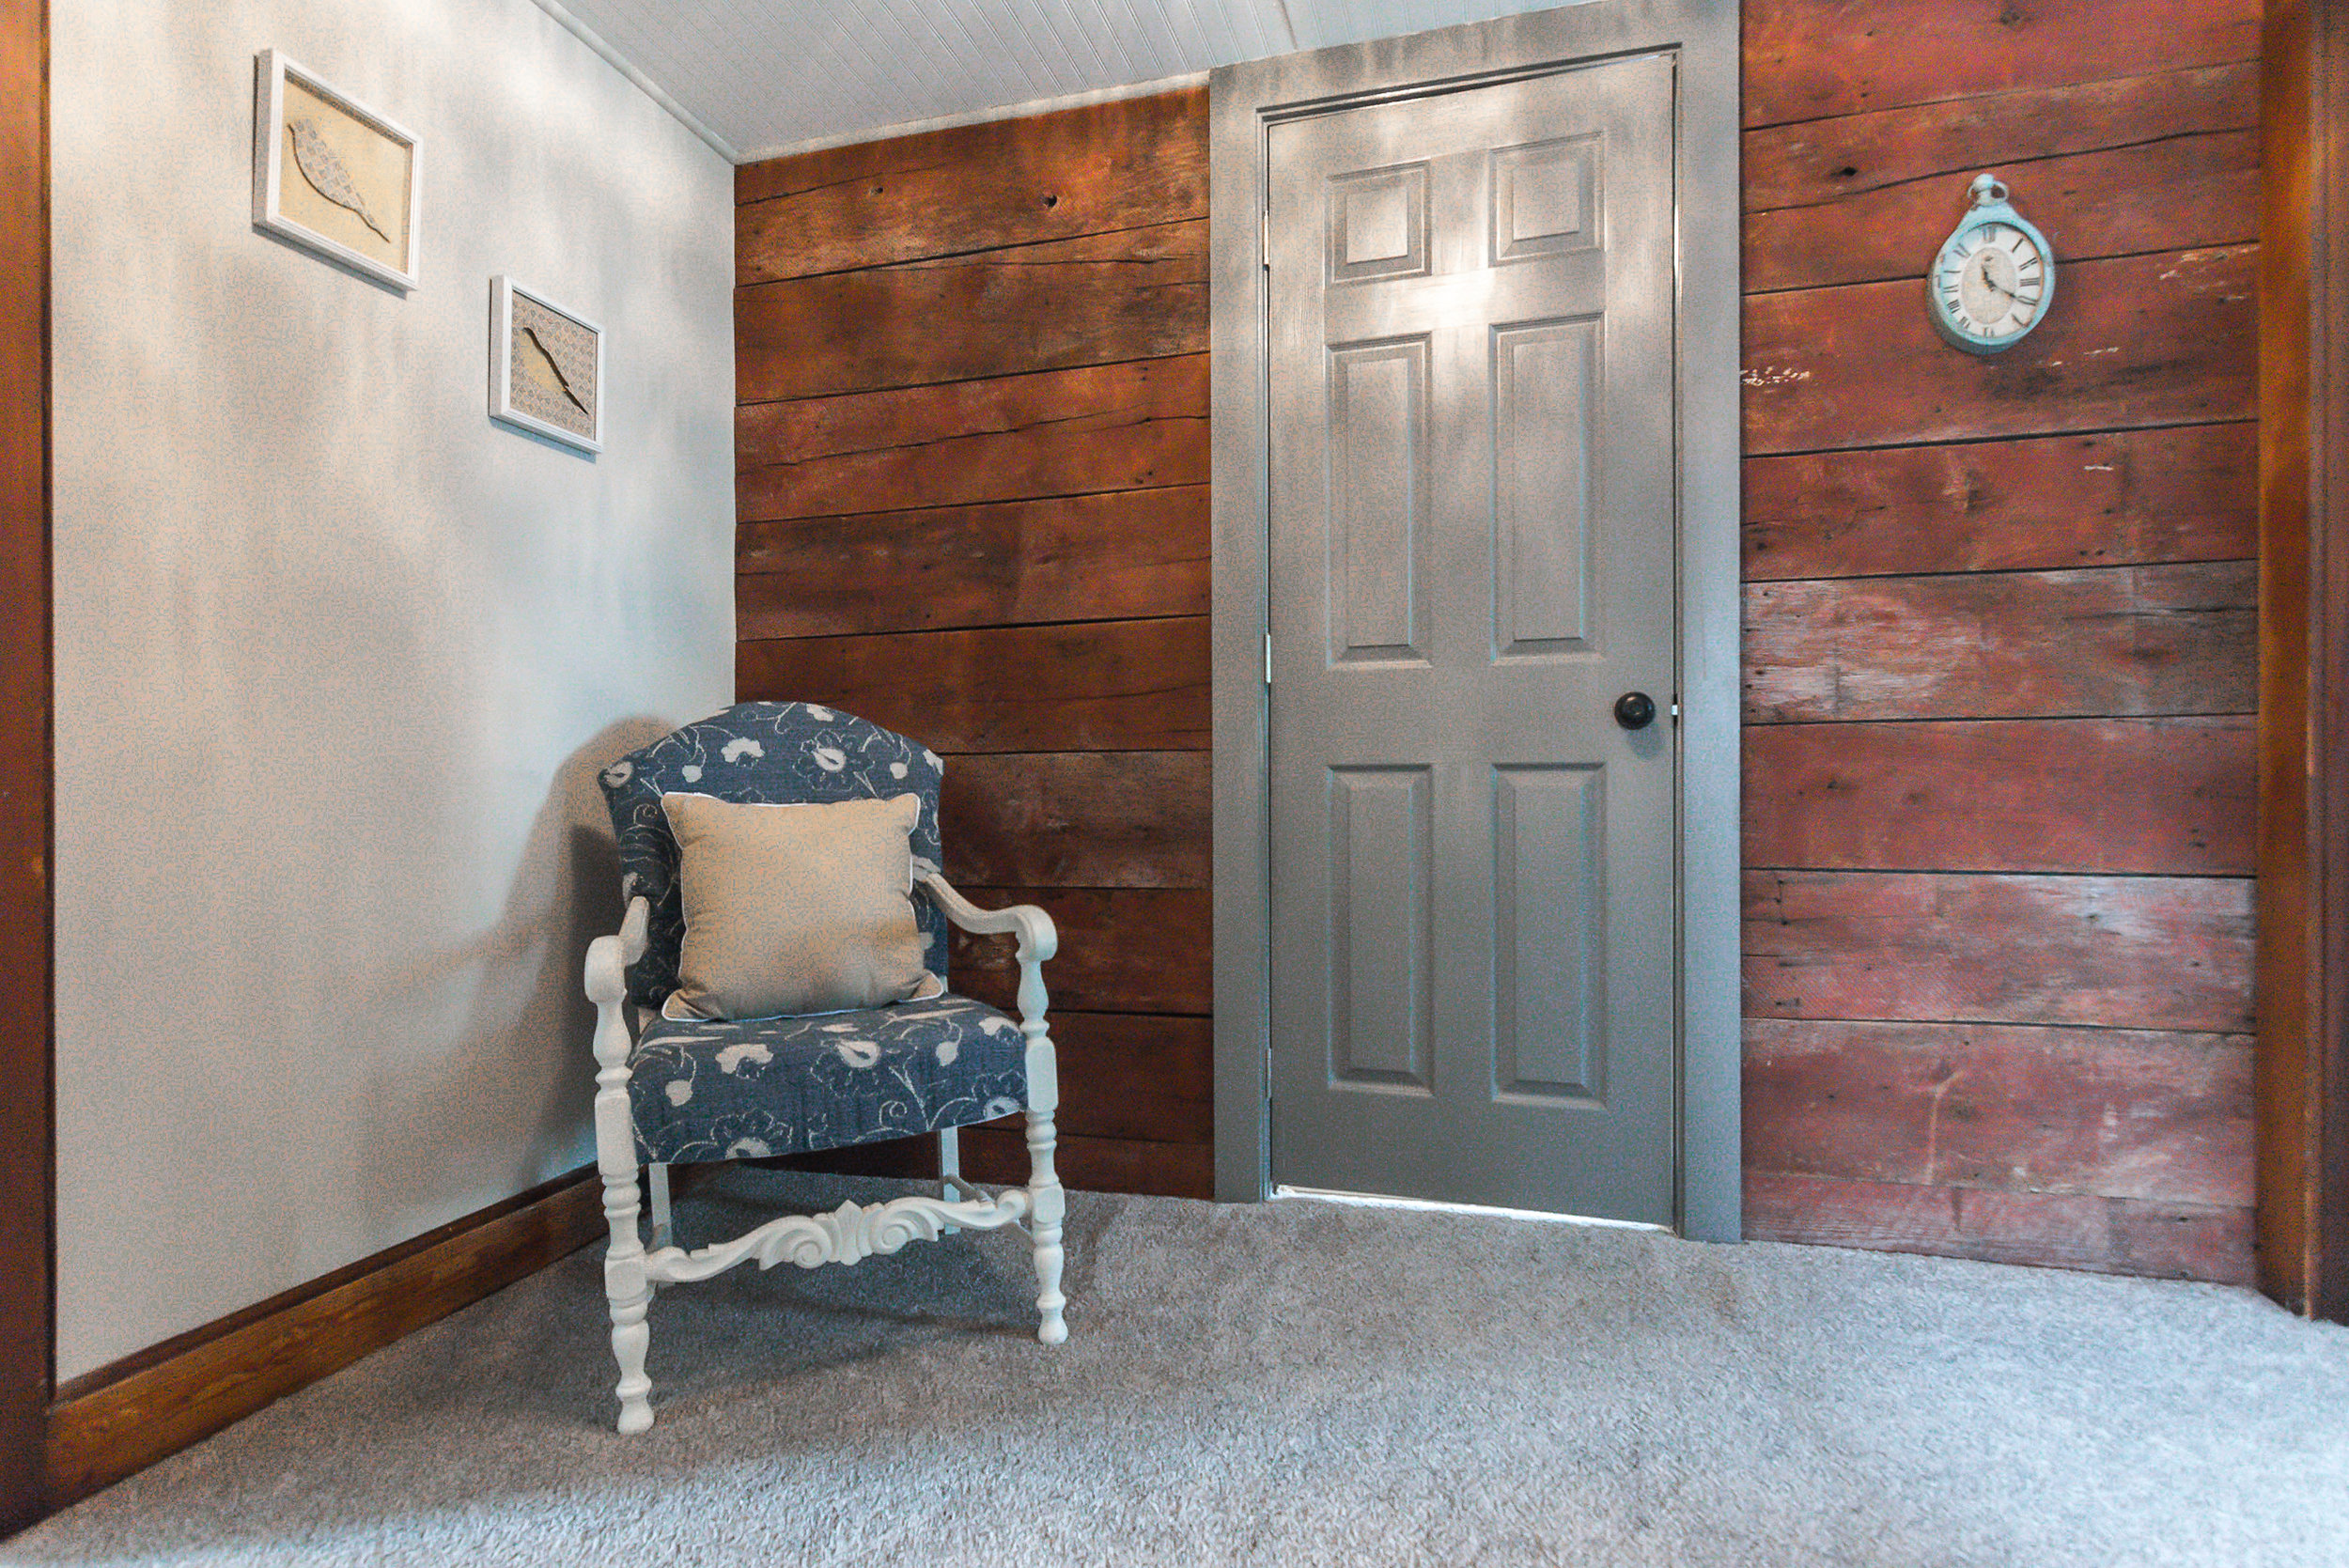 Stone-Cottage-Hermann-Missouri-vacation-rental-10-1020.jpg